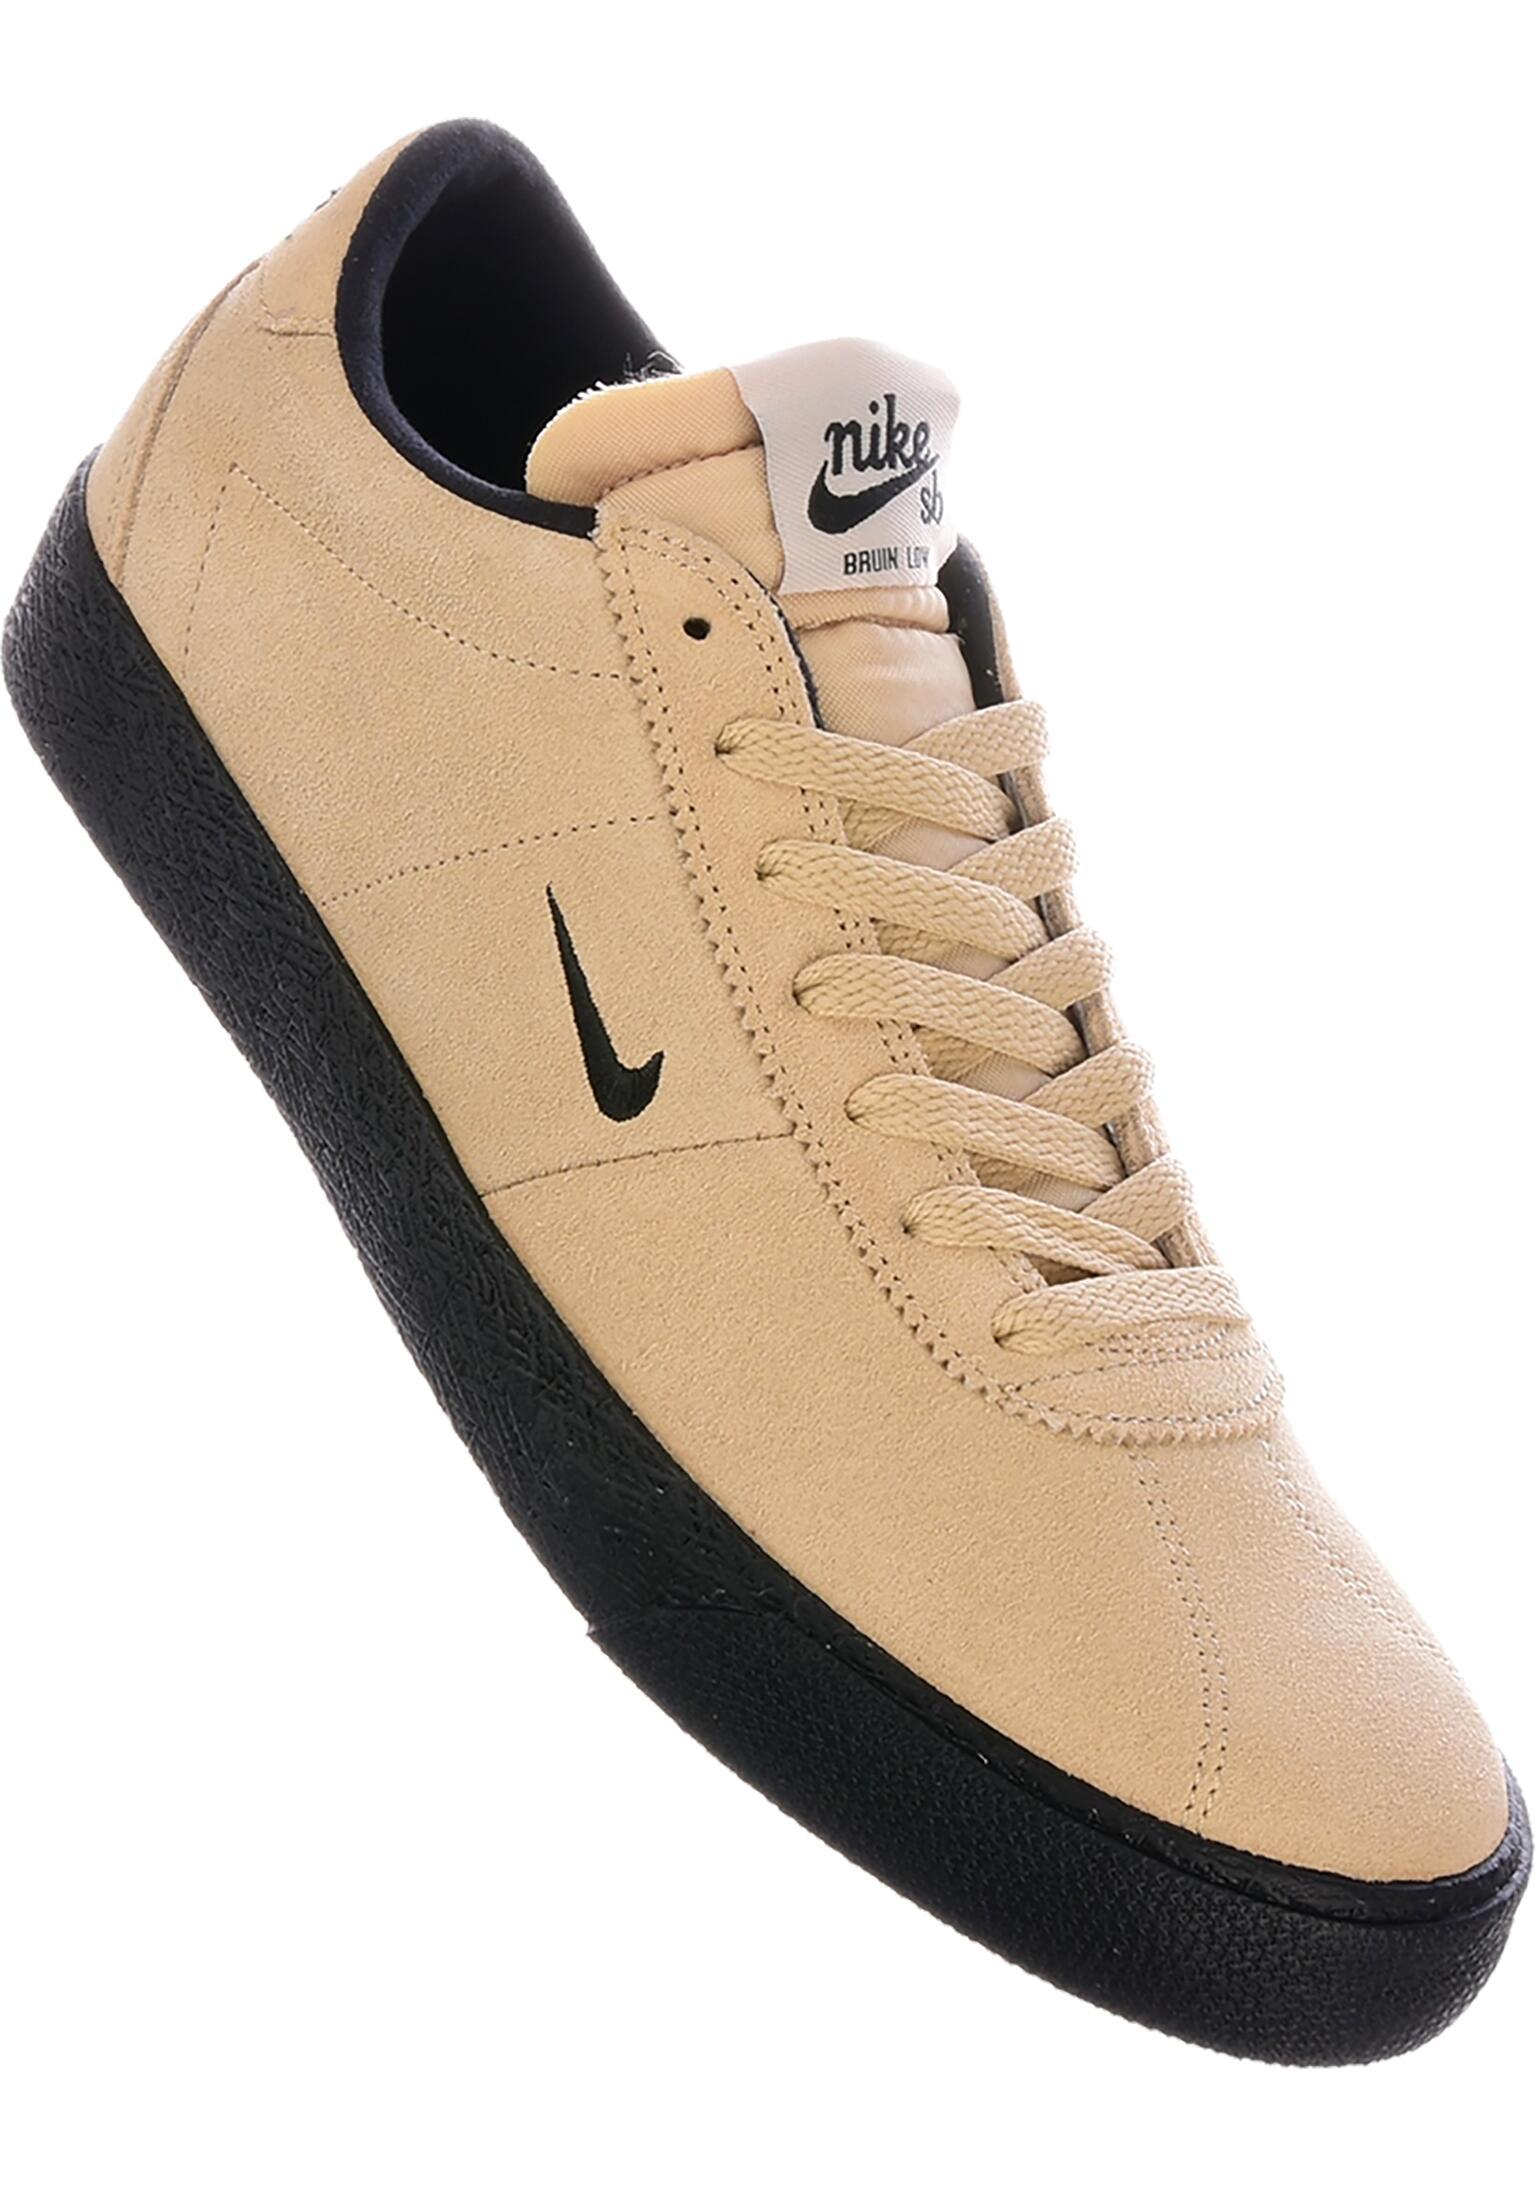 03604235dd2ec Zoom Bruin Ultra Nike SB All Shoes in desertore-black for Men